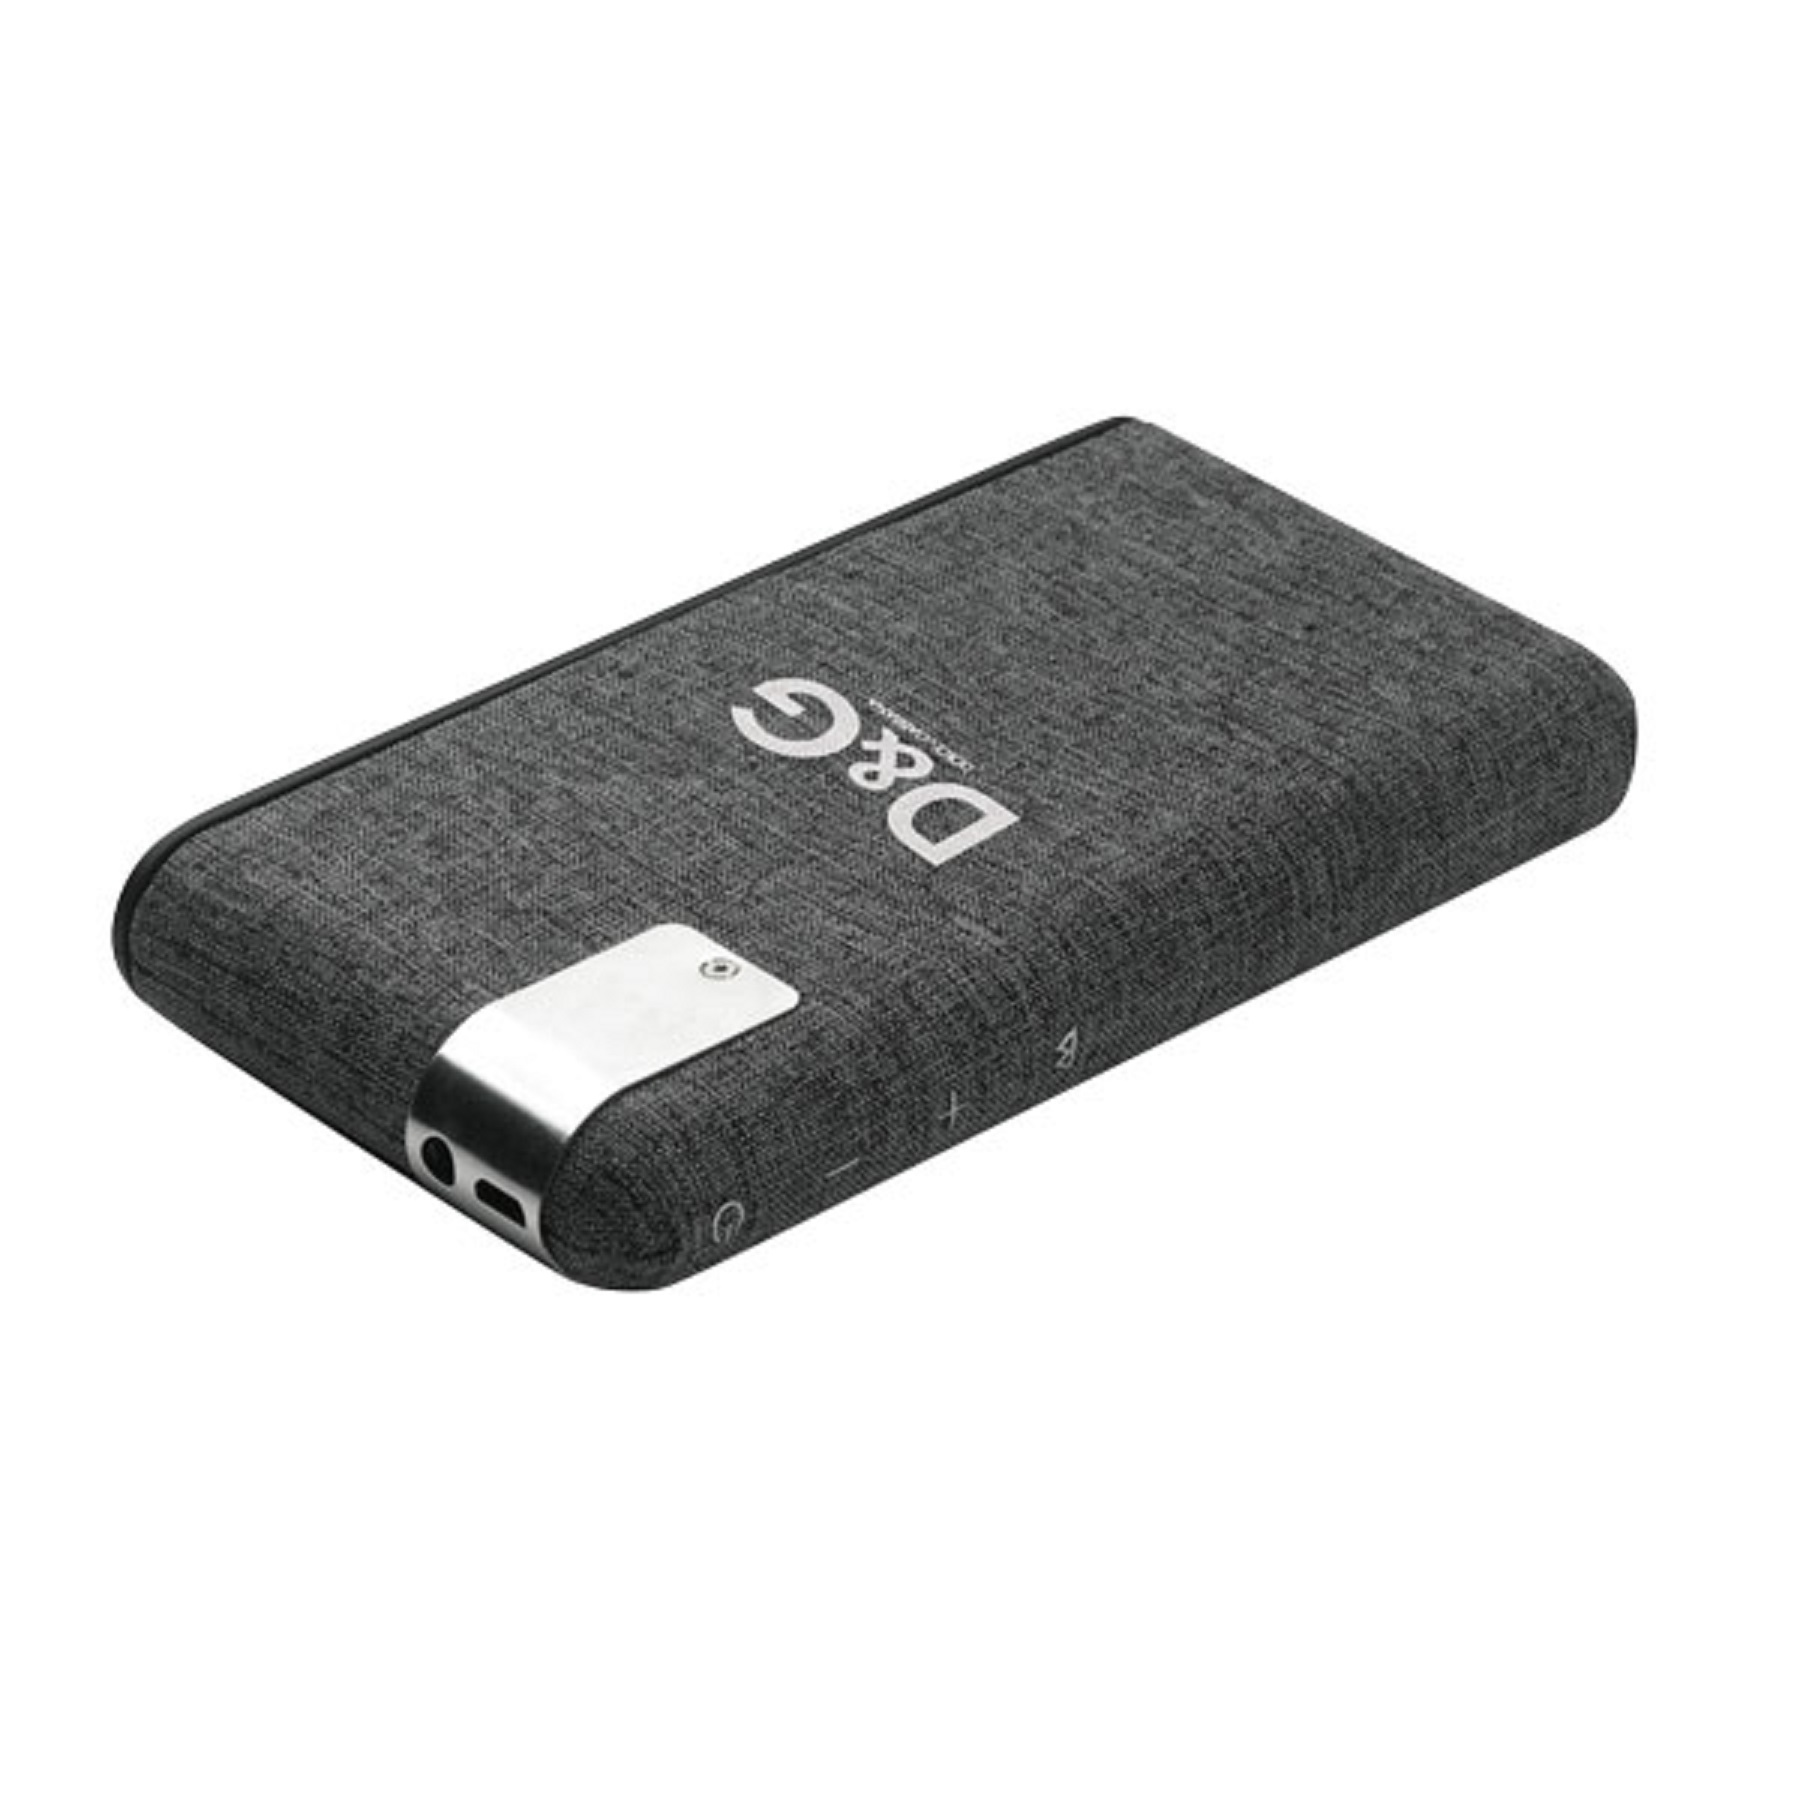 945343245-202 - Urban Speaker - mini portable bluetooth speaker - thumbnail